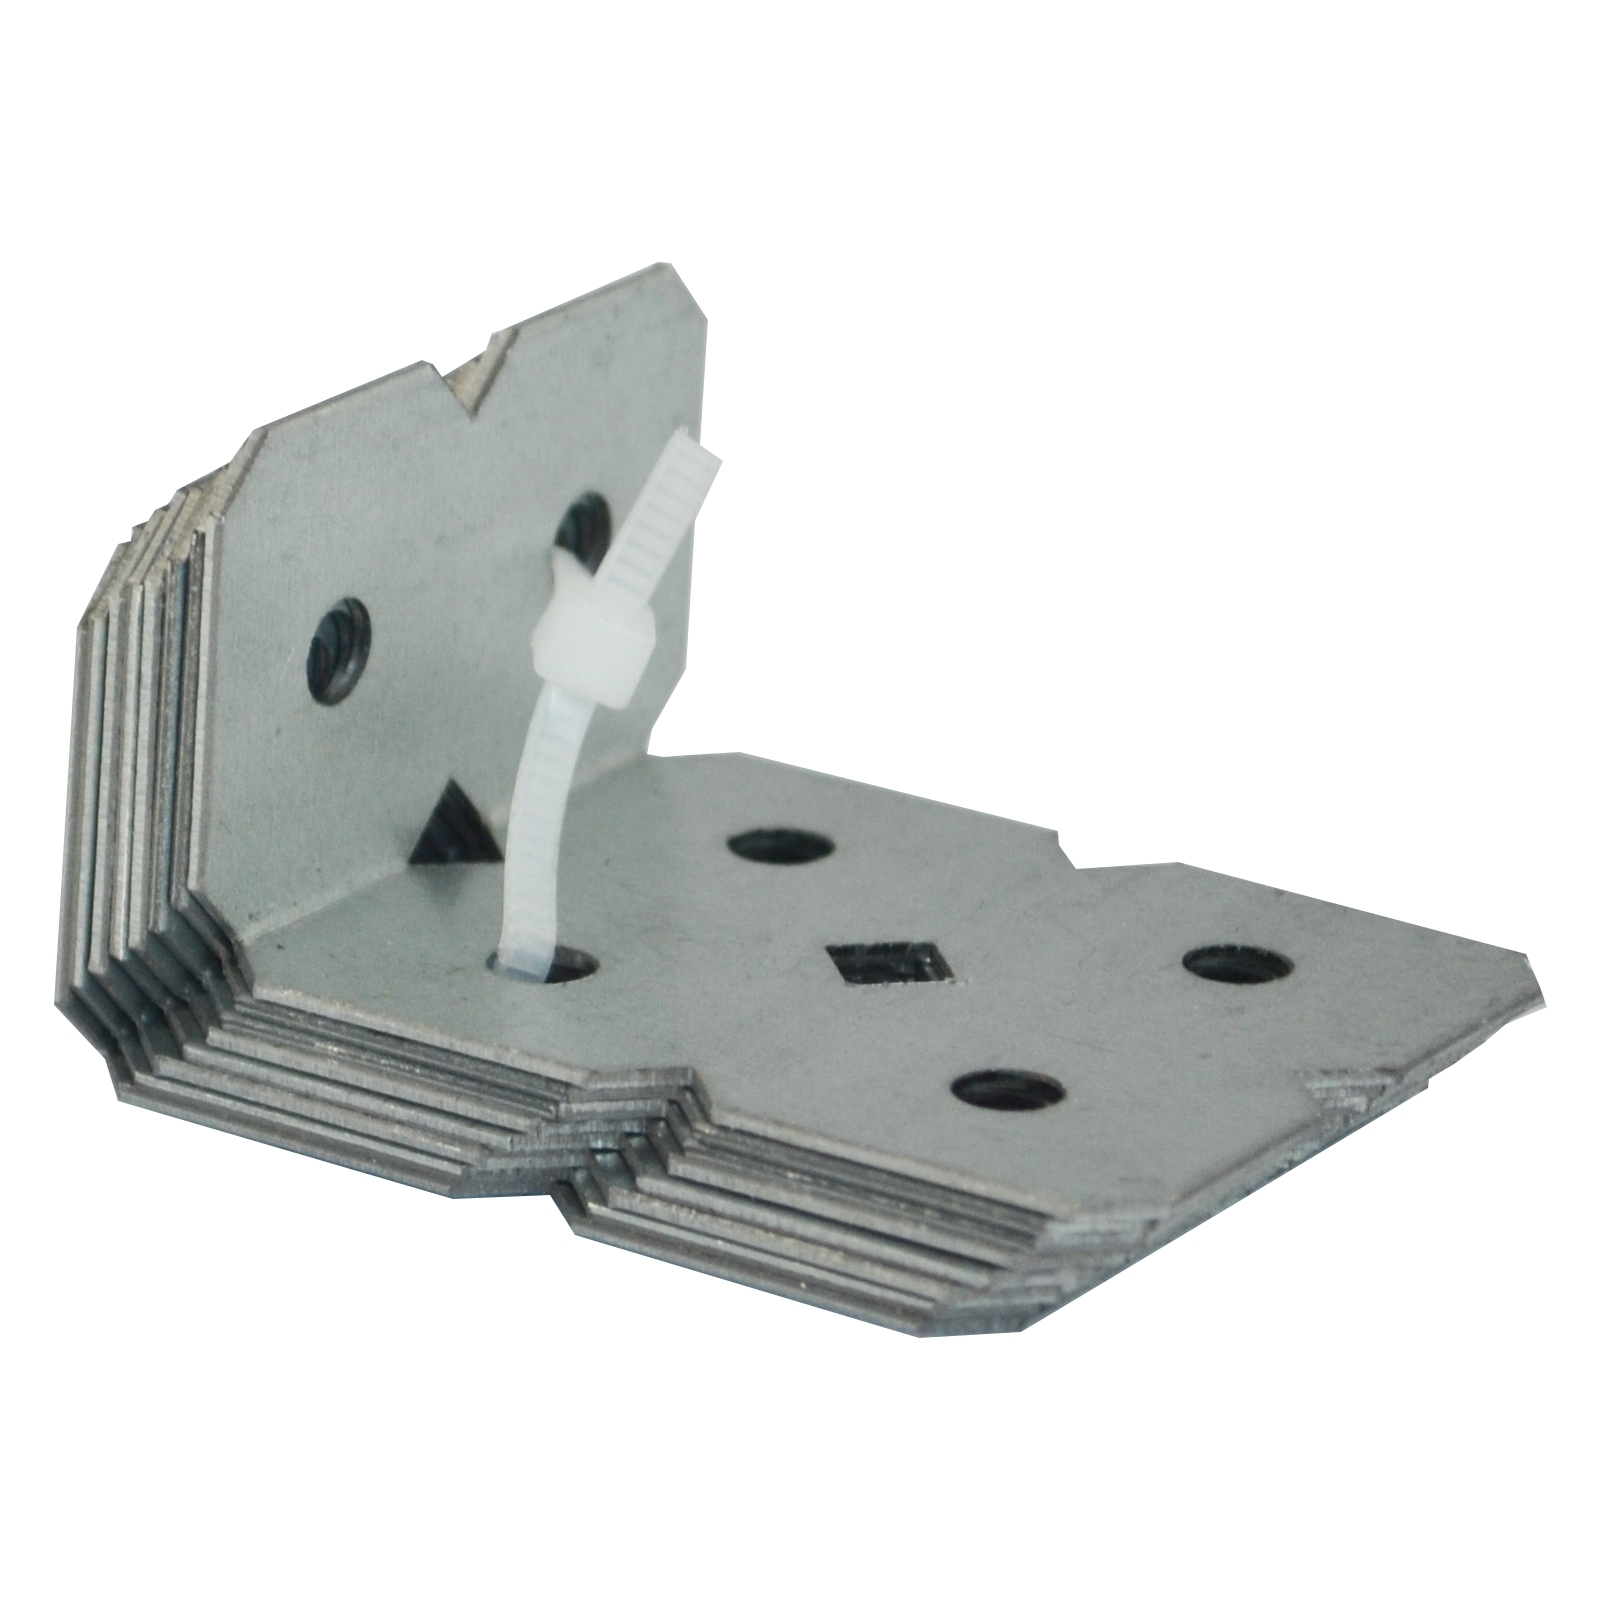 Carinya 25 x 50 x 40 x 1mm Galvanised Angle Bracket - 8 Pack